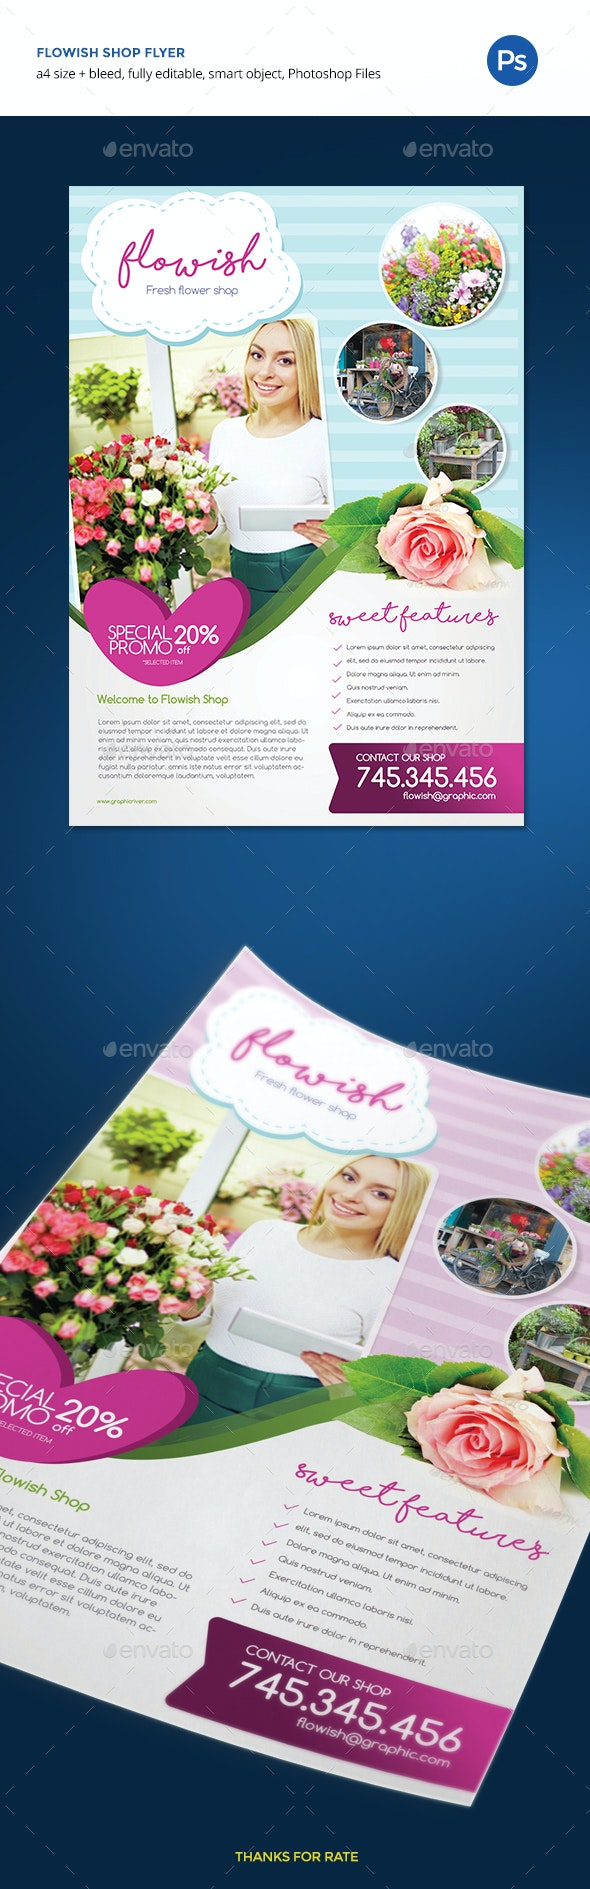 Flowish Shop Flyer - Commerce Flyers